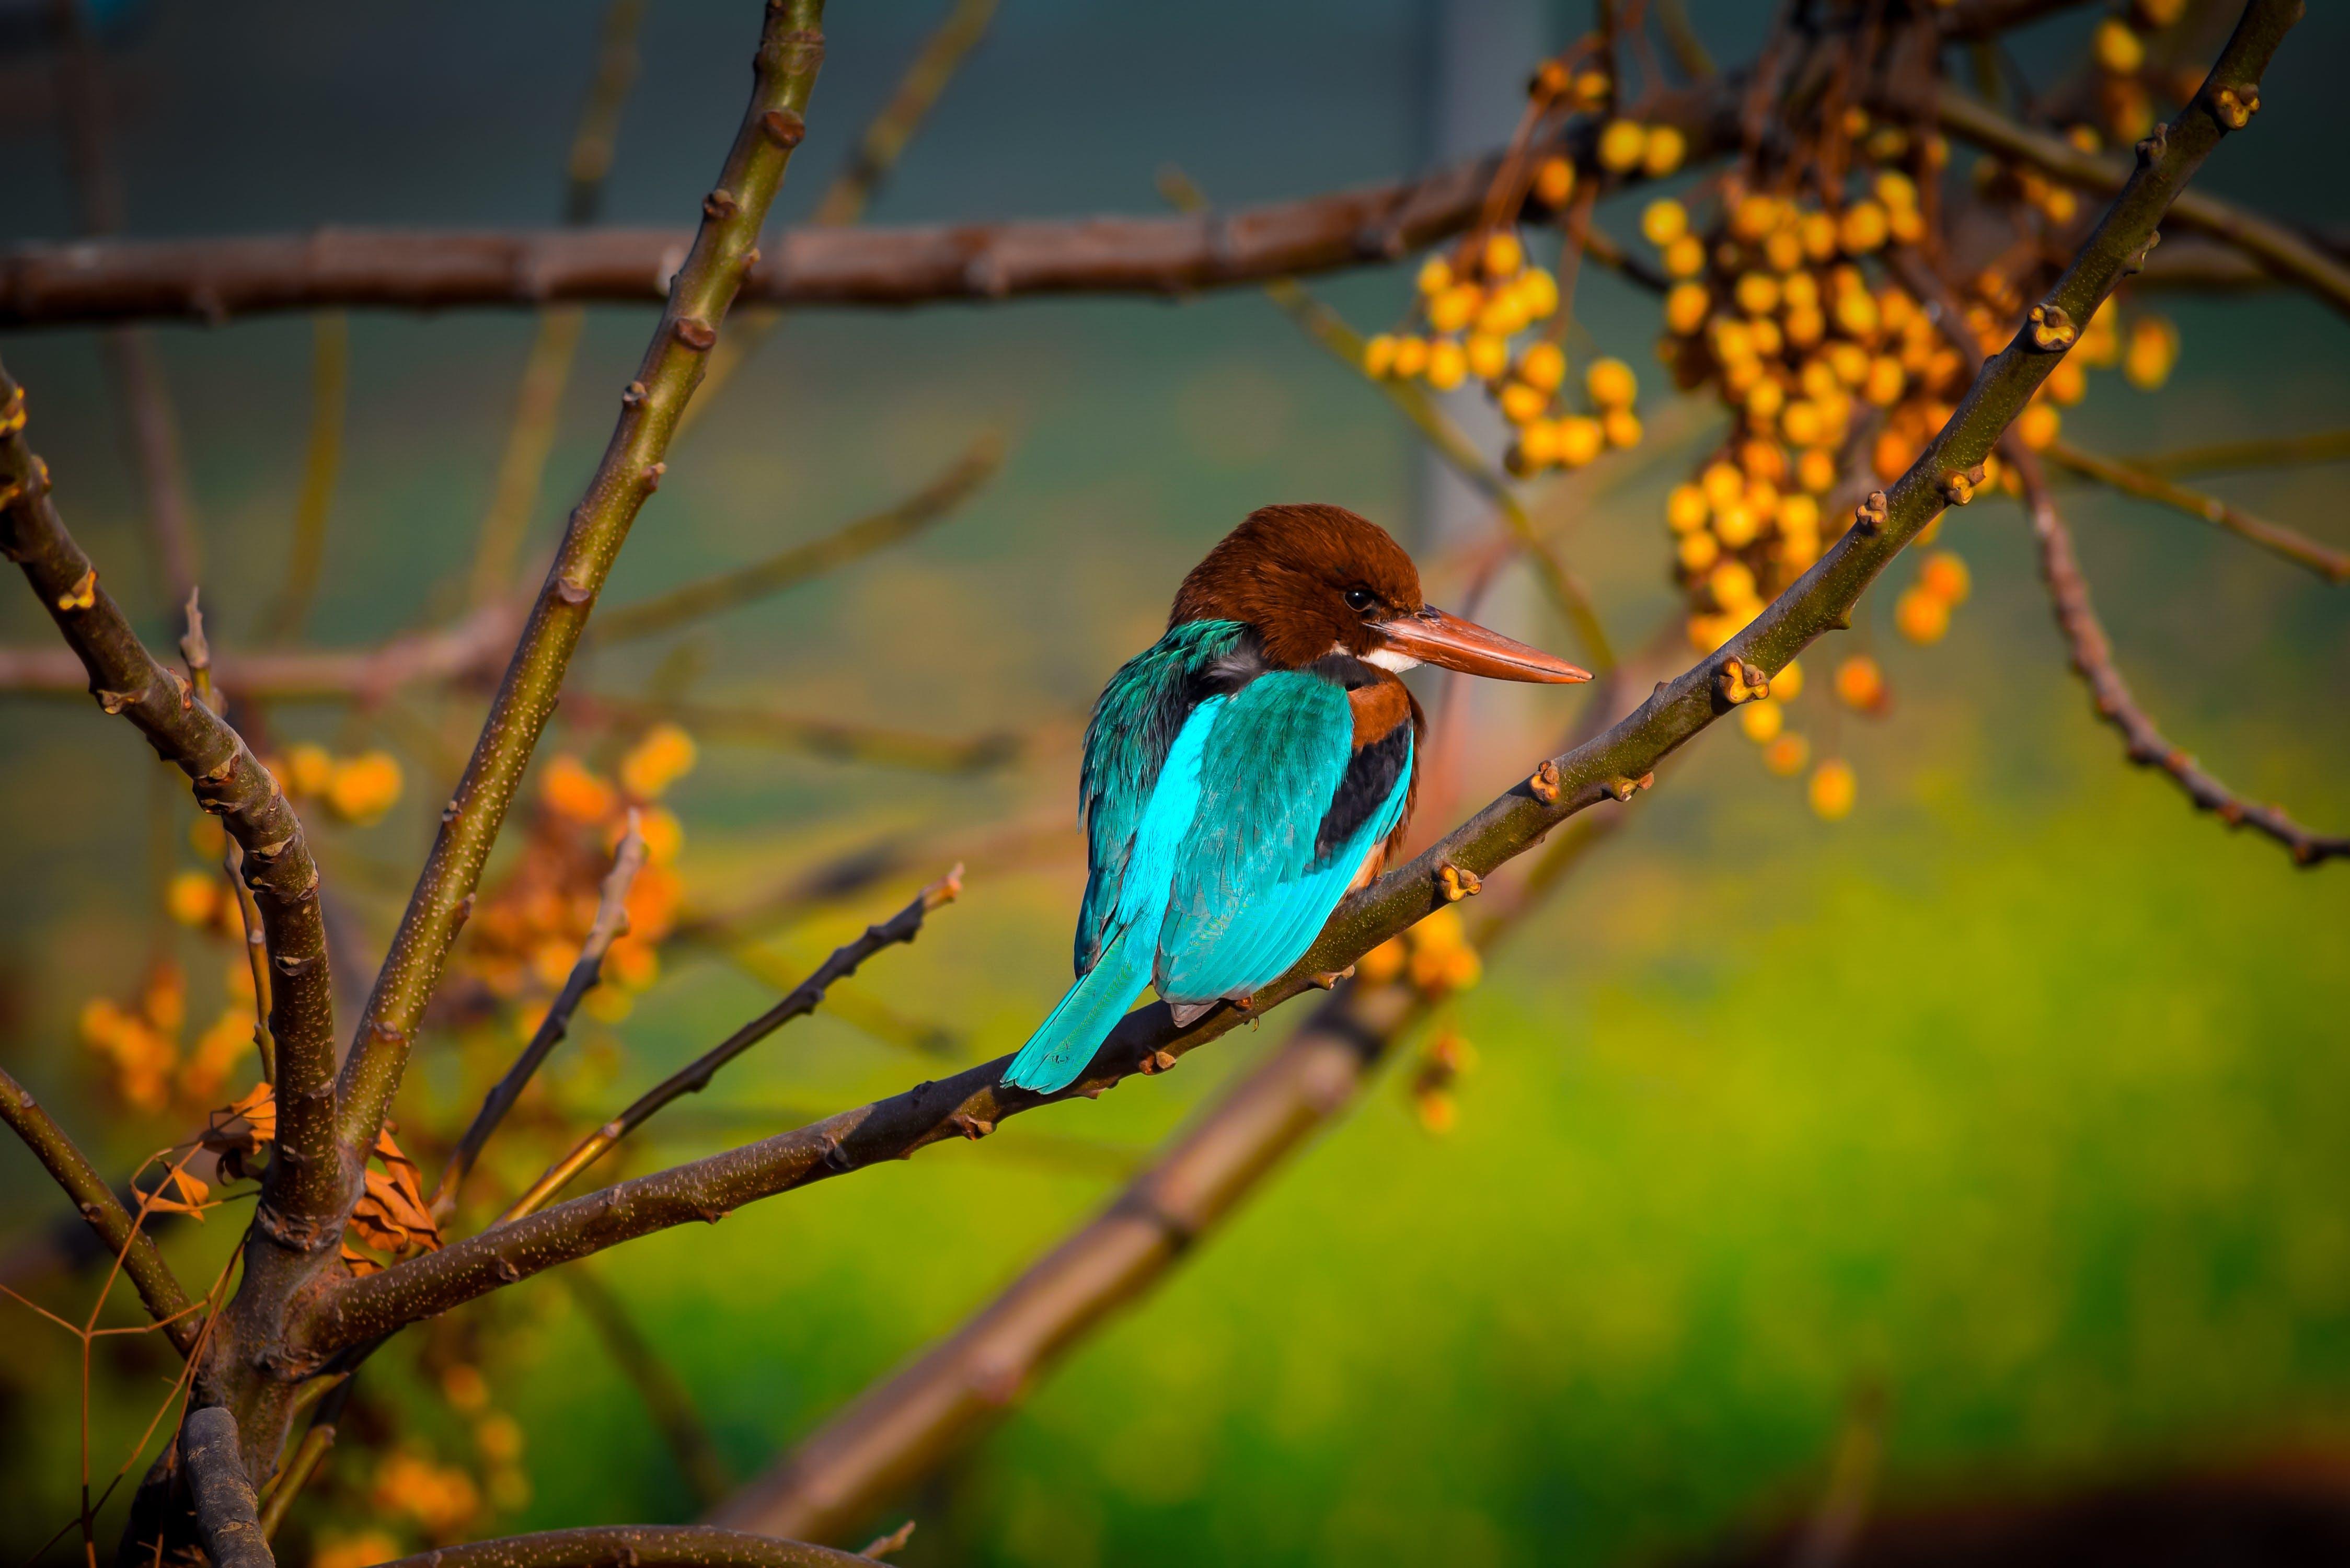 Free stock photo of animal, bamboo trees, bird feeder, golden sun